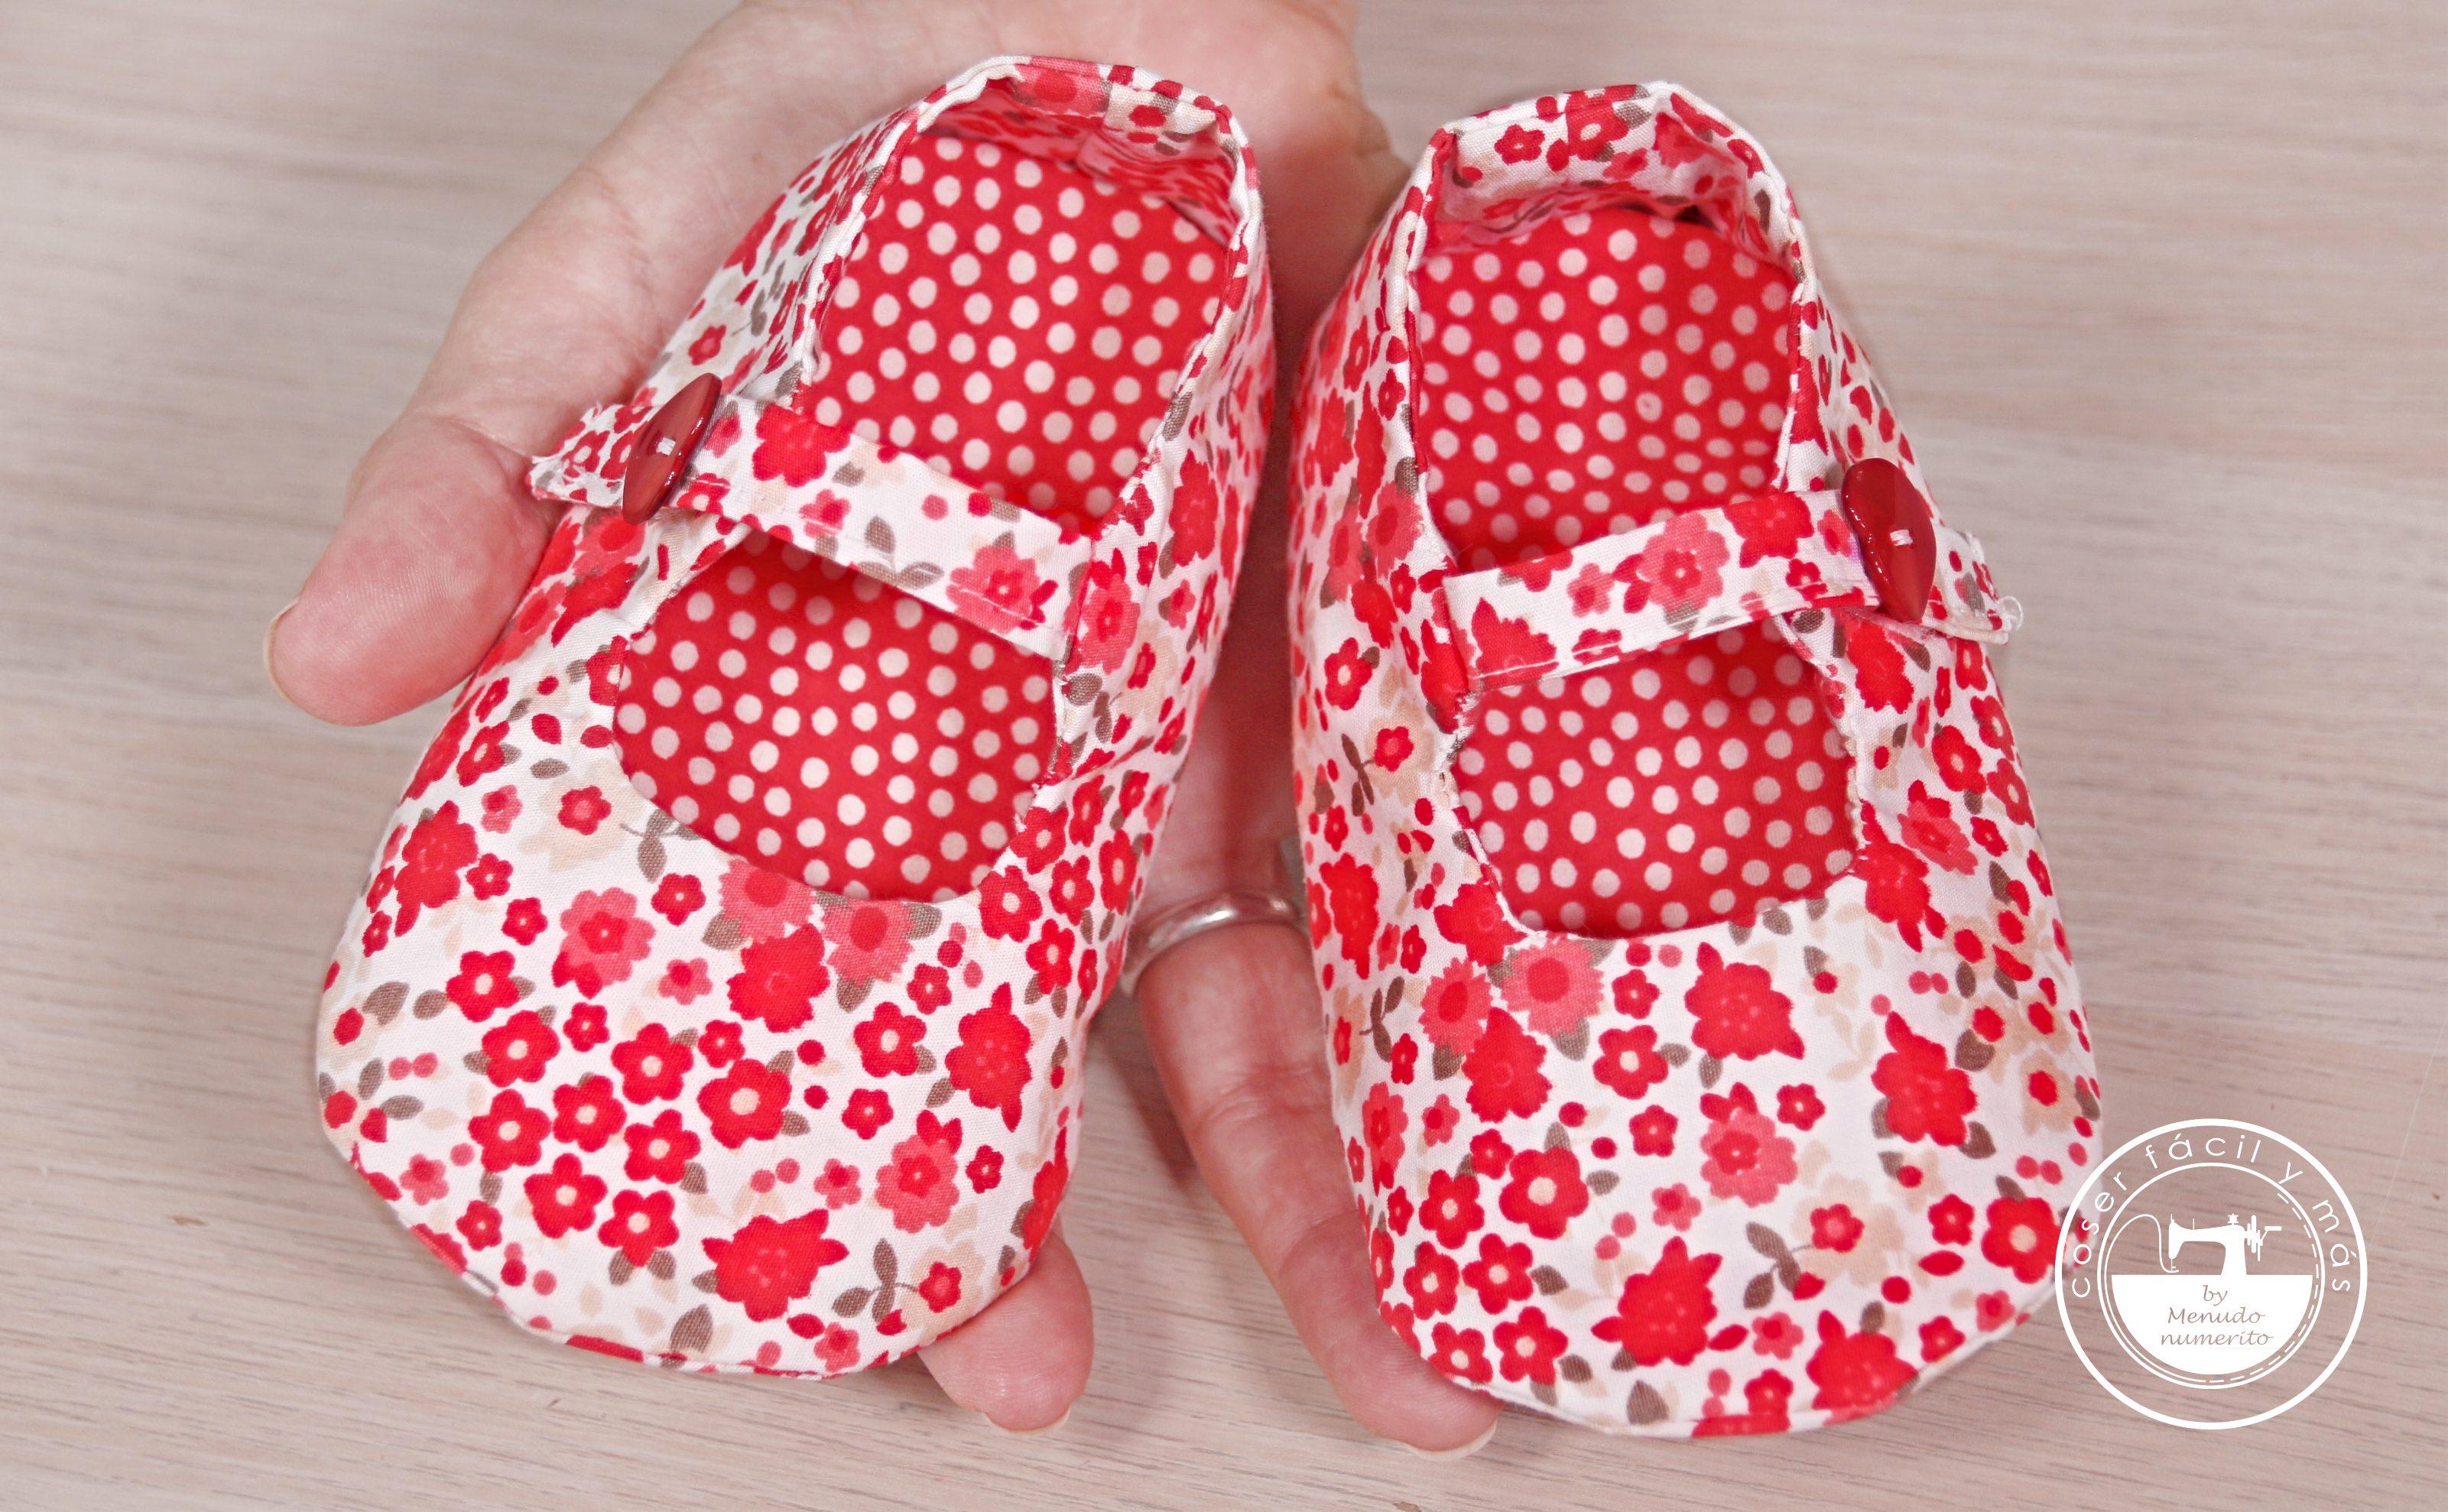 zapatos de bebe tela coser facil blogs de costura menudo numerito